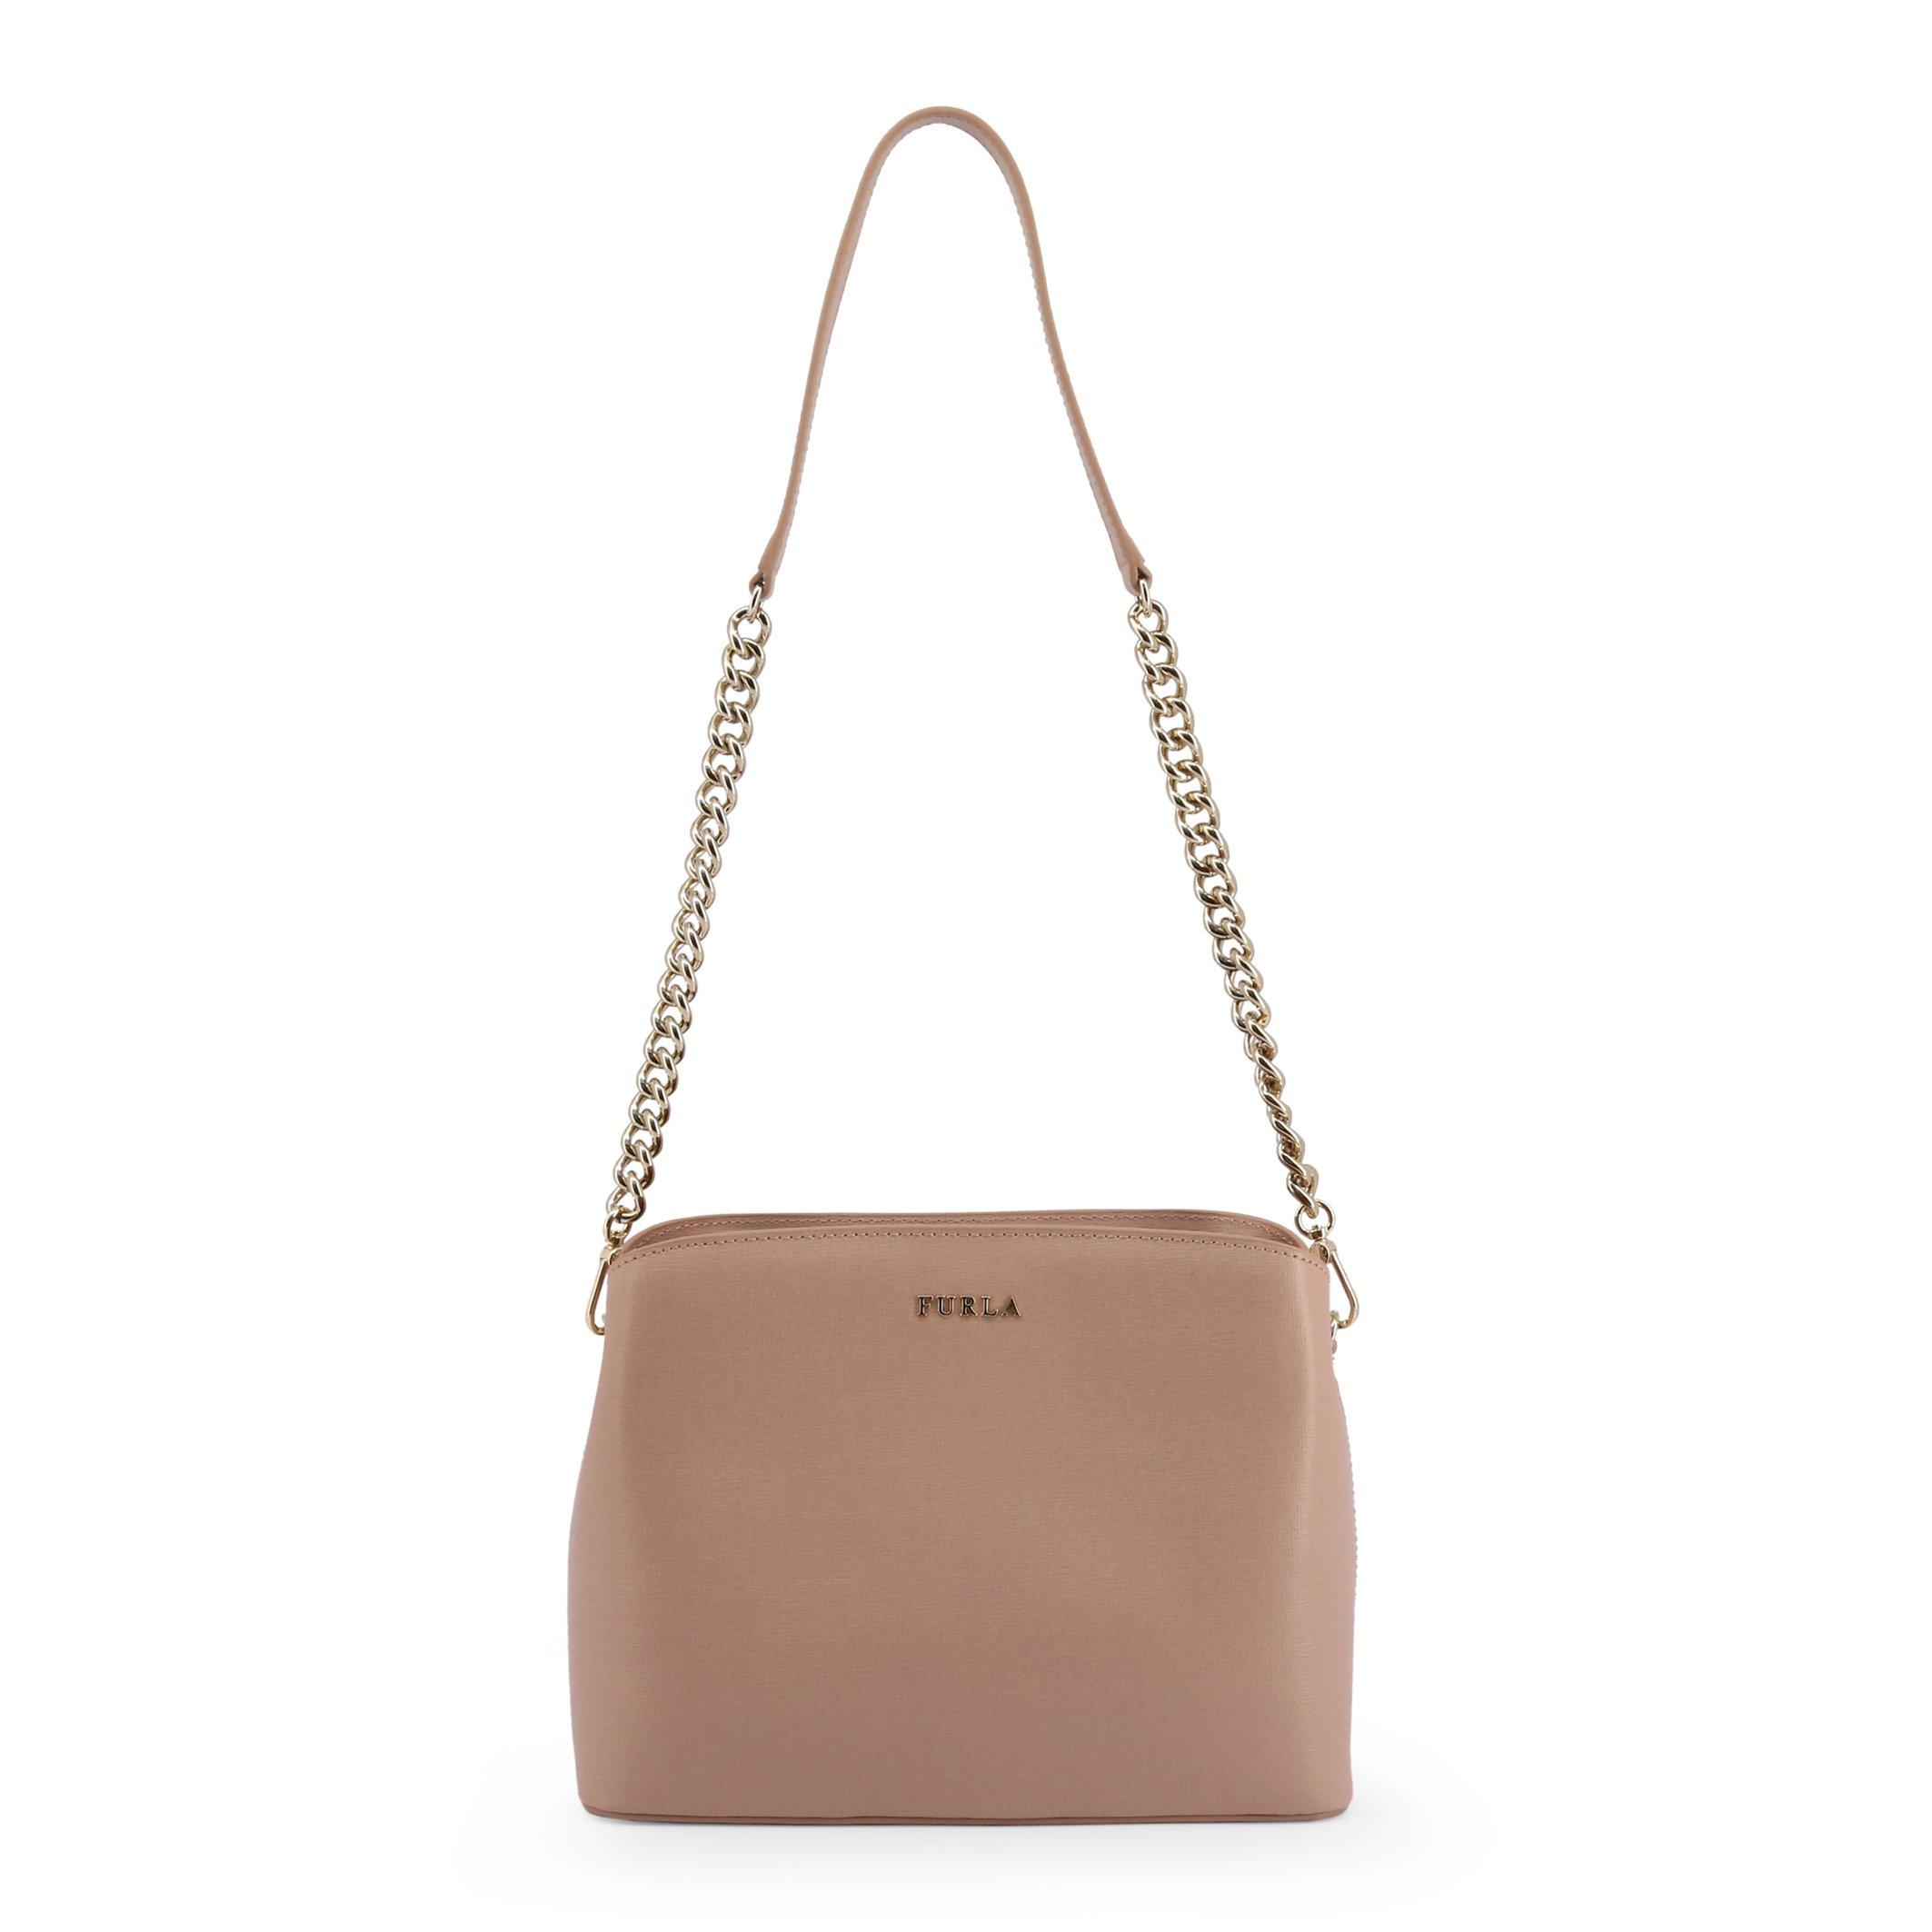 Furla Women's Shoulder Bag Various Colours TESSA_BWA9 - pink NOSIZE